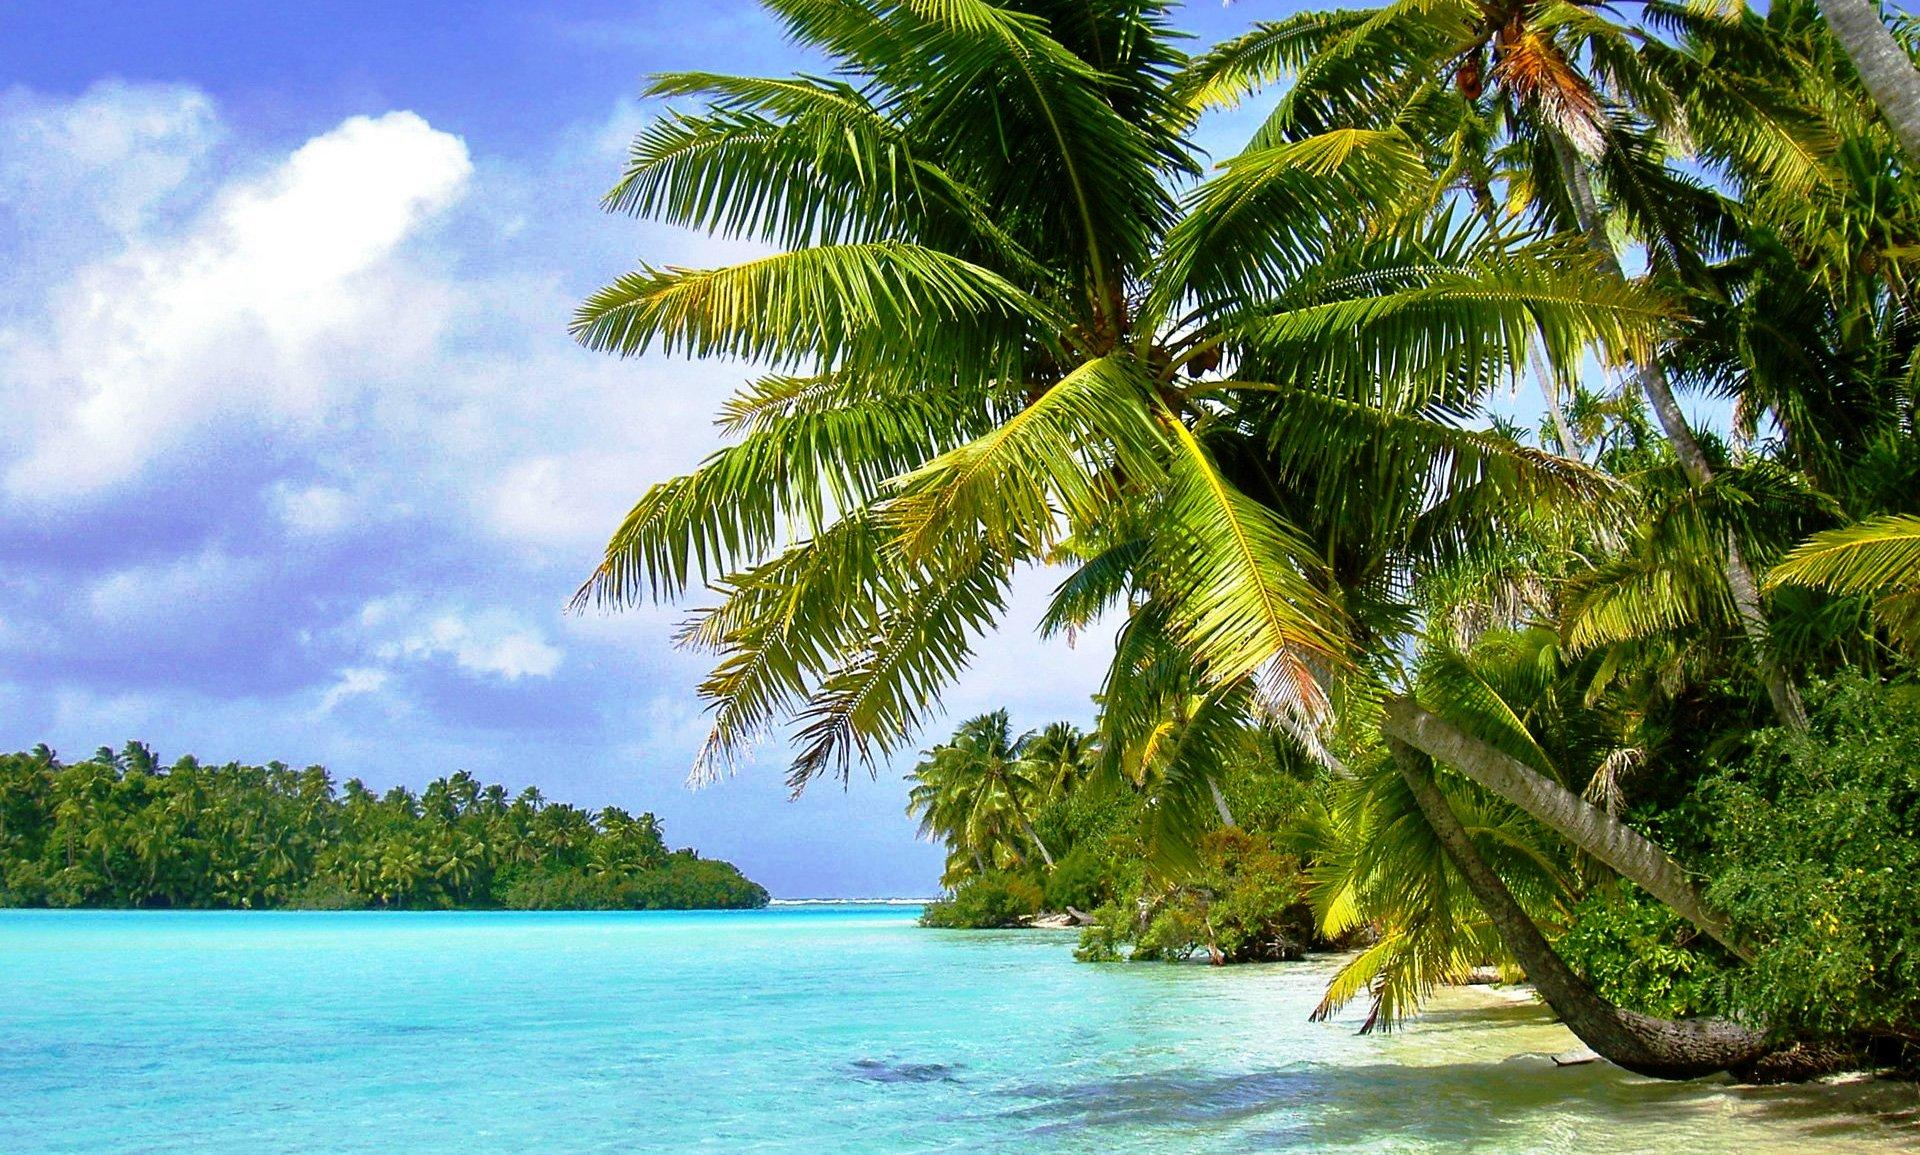 Tropical Island Hd Wallpaper | Wallpaper List